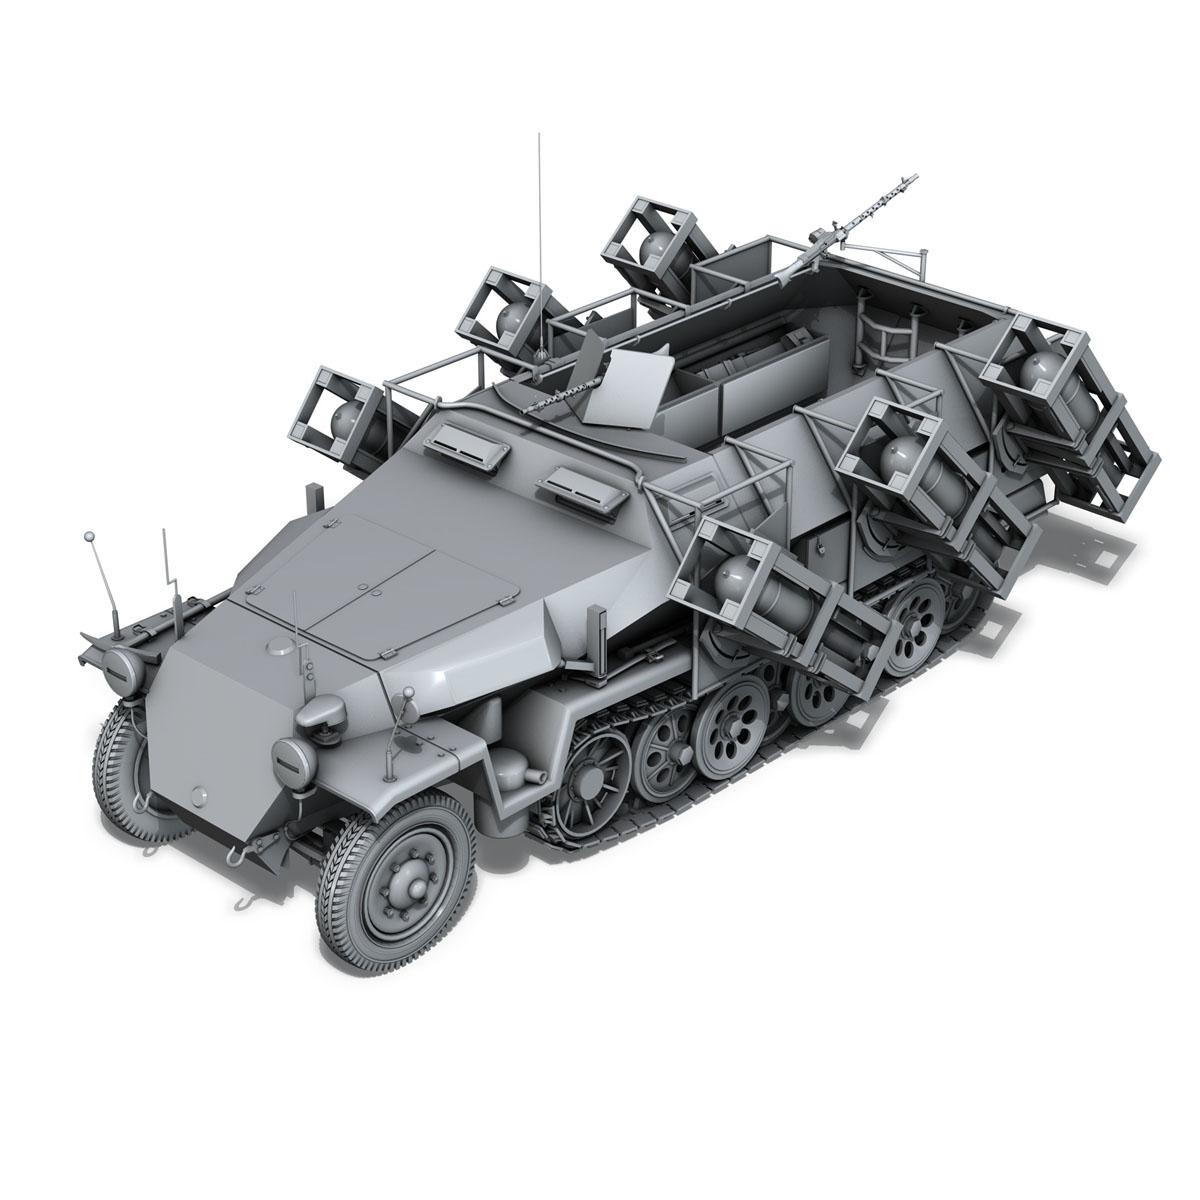 sd.kfz 251/1 ausf.c – walking stuka 3d model 3ds fbx c4d lwo obj 201239